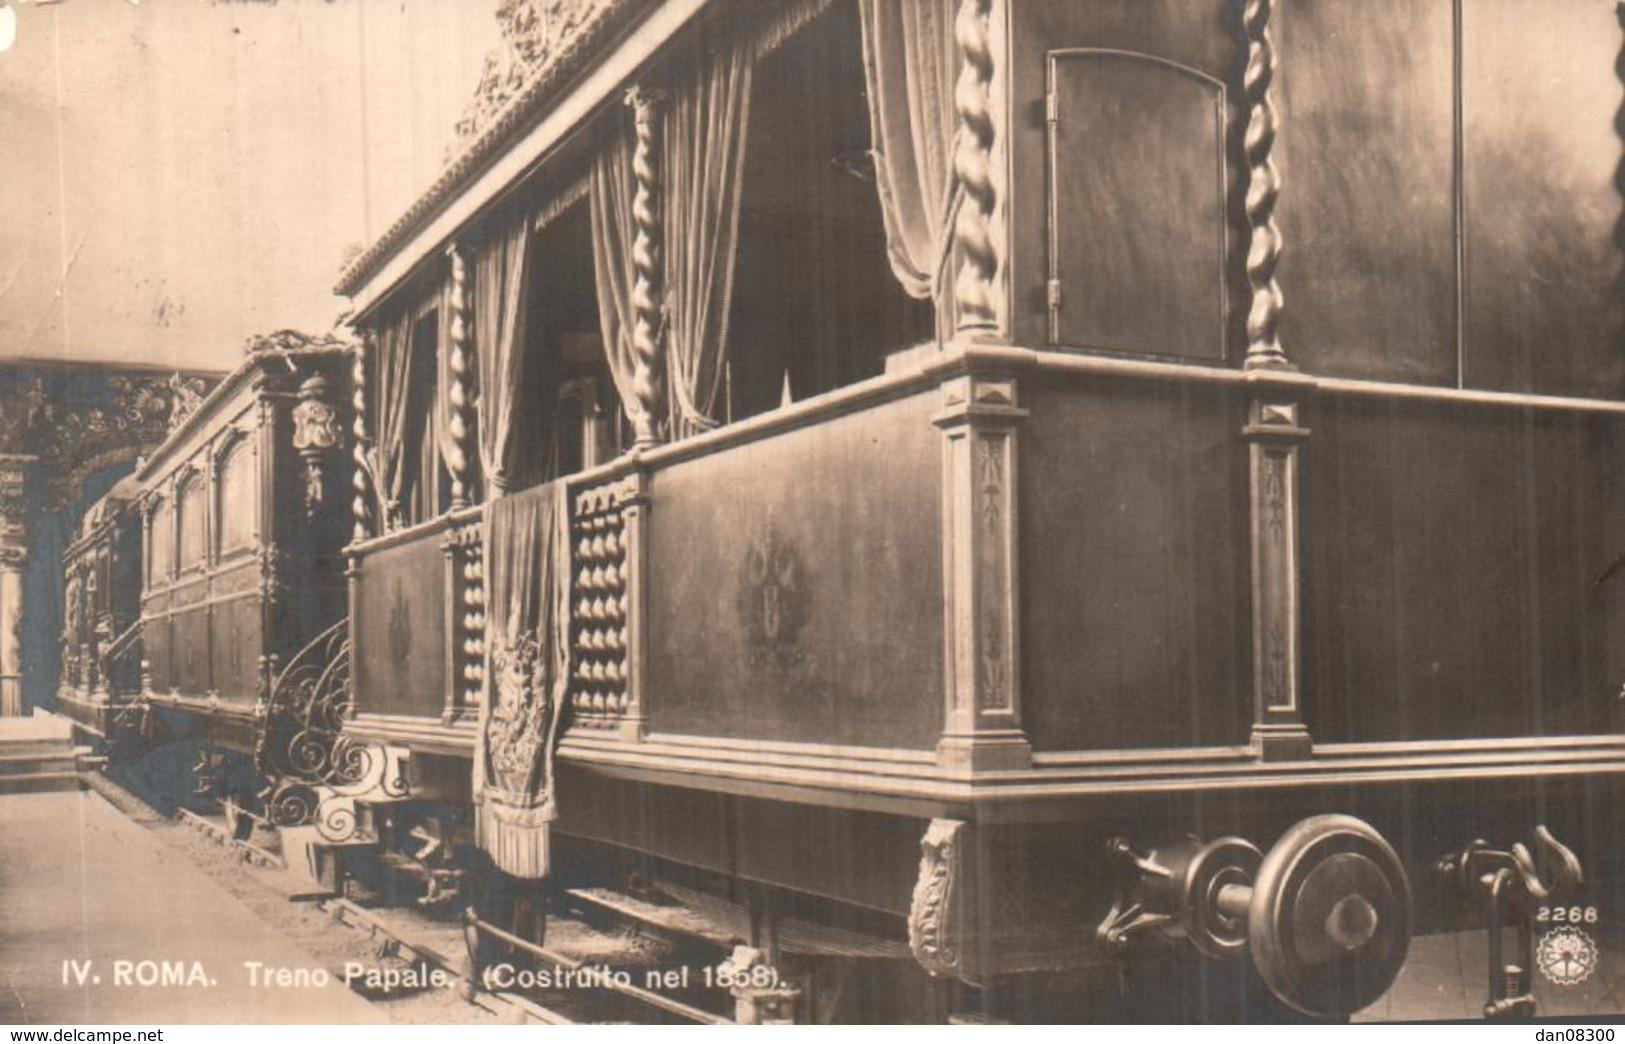 RARE  ROMA TRENO PAPALE CONSTRUITO NEL 1858 (LE TRAIN DU PAPE CONSTRUIT EN 1858) CIRCULEE 1914 - Treni